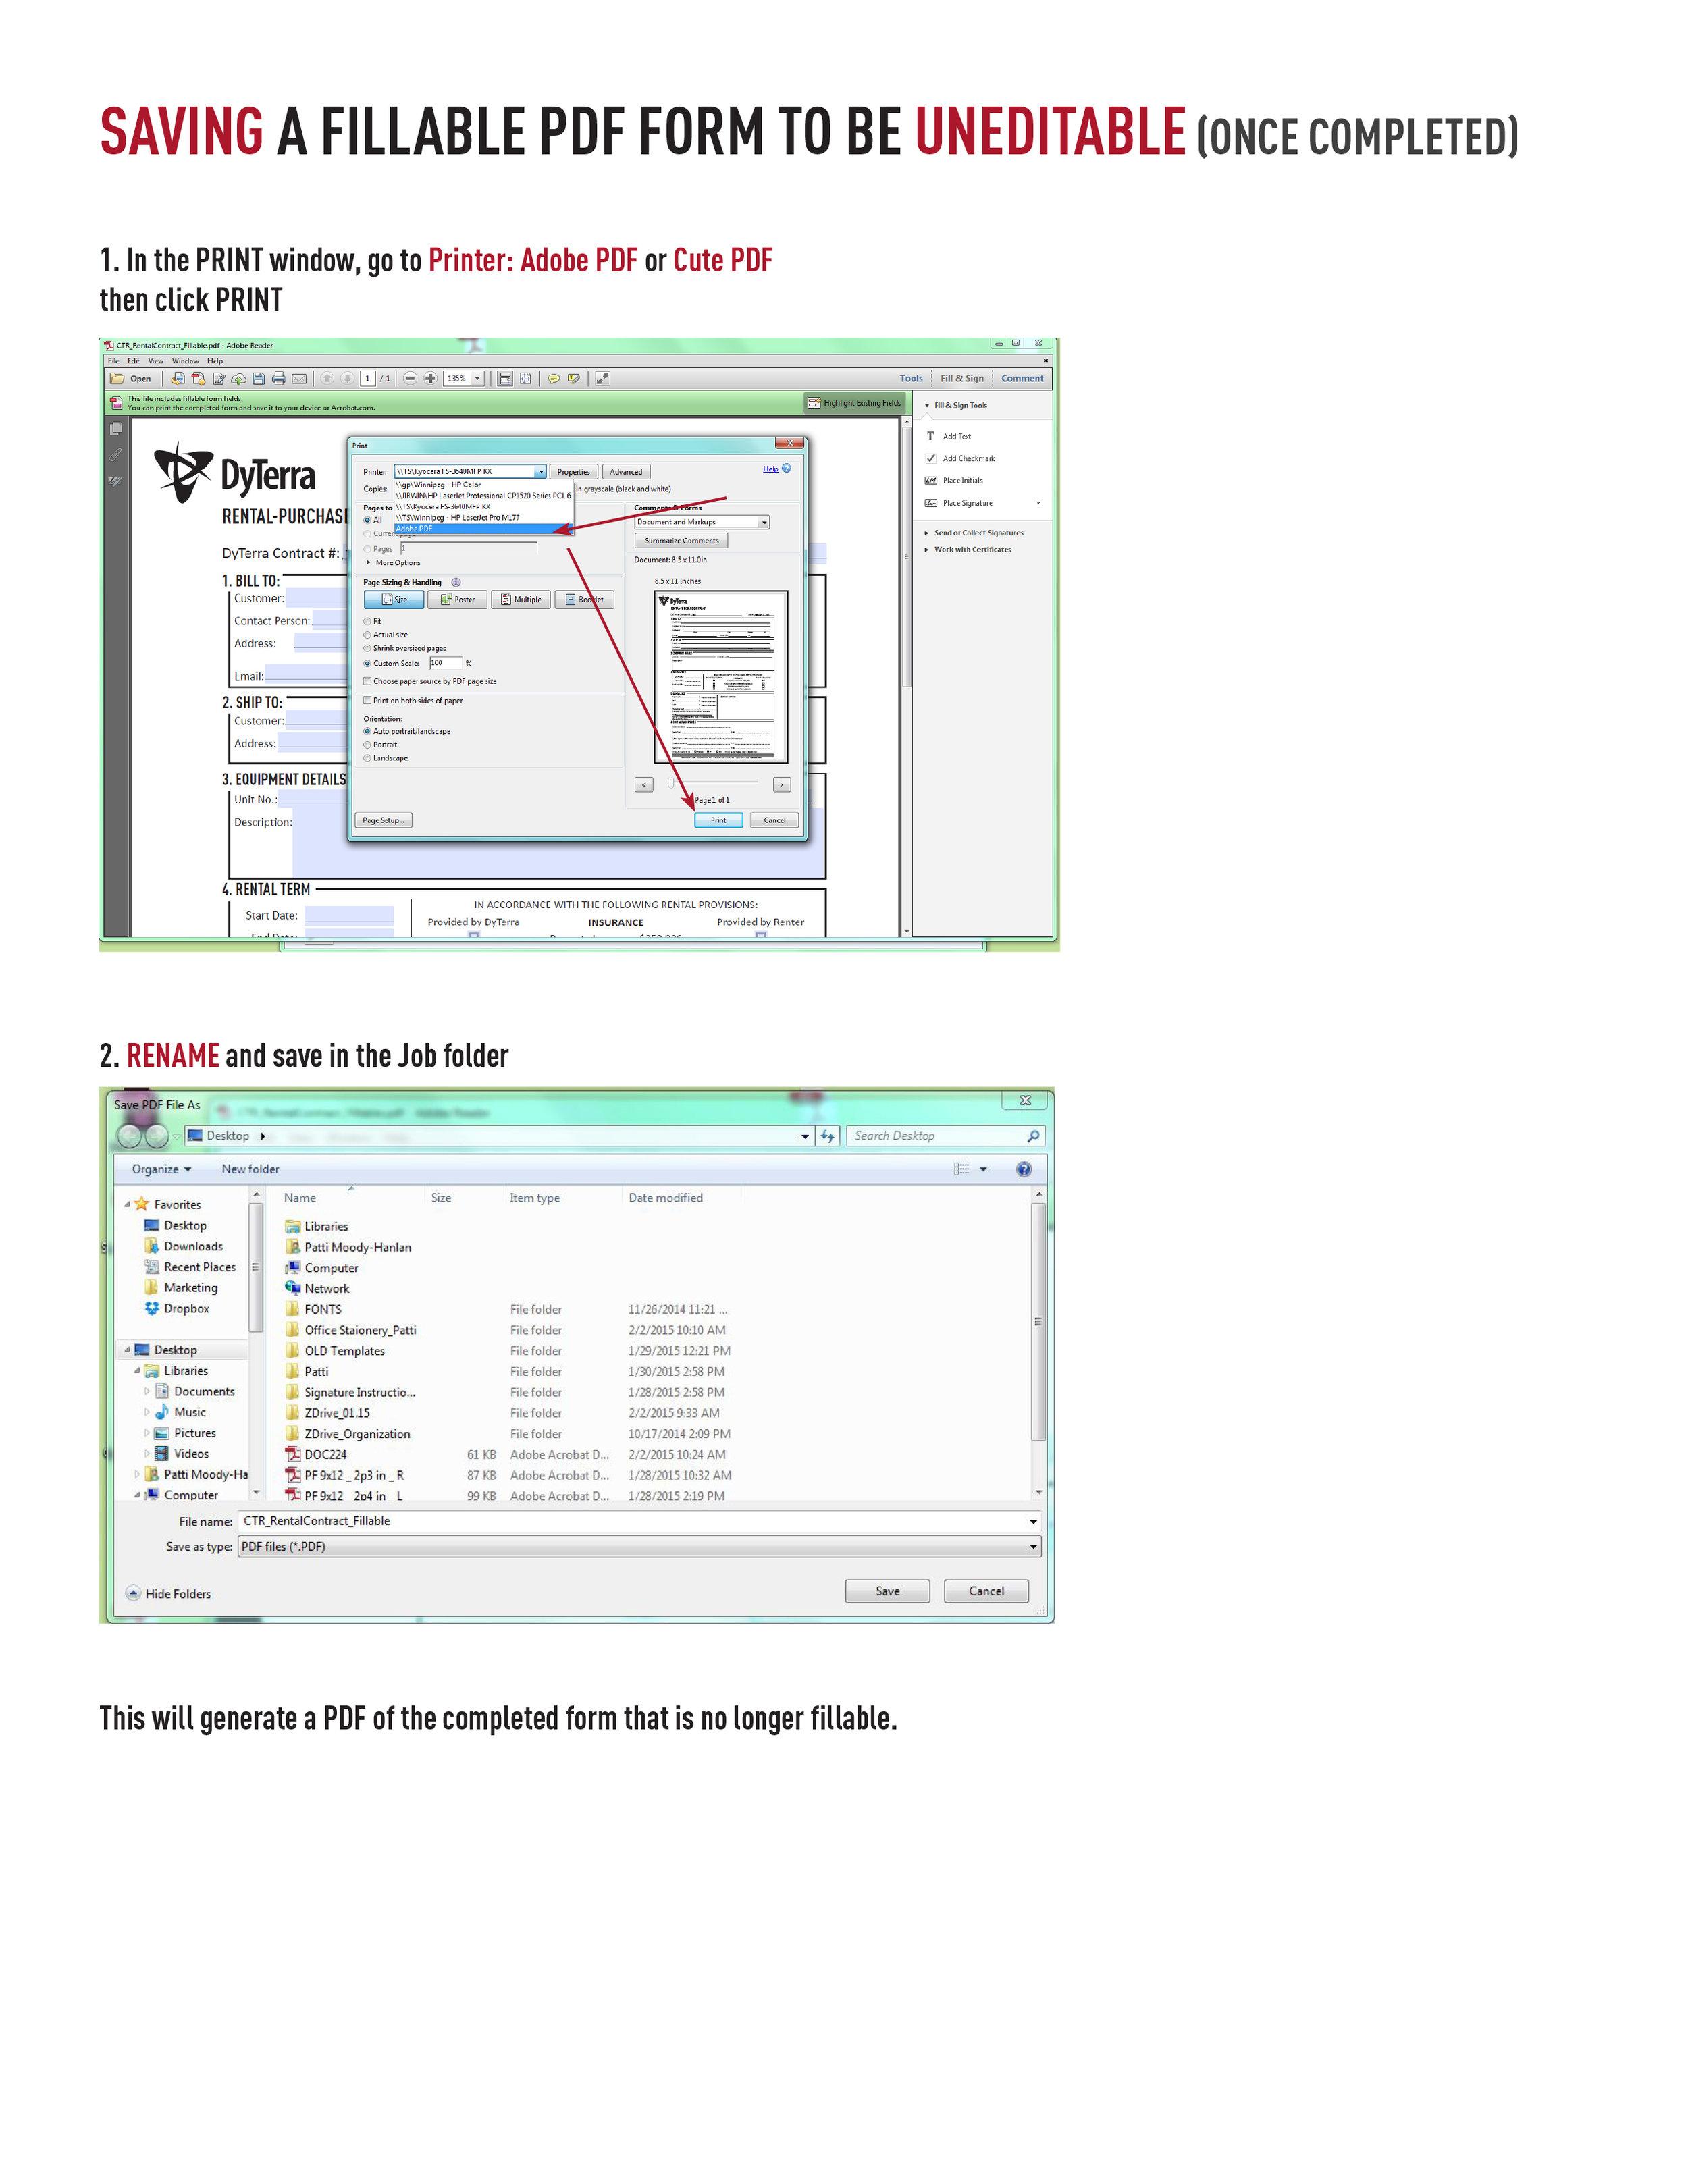 DyTerra_PhoneDirectory.jpg